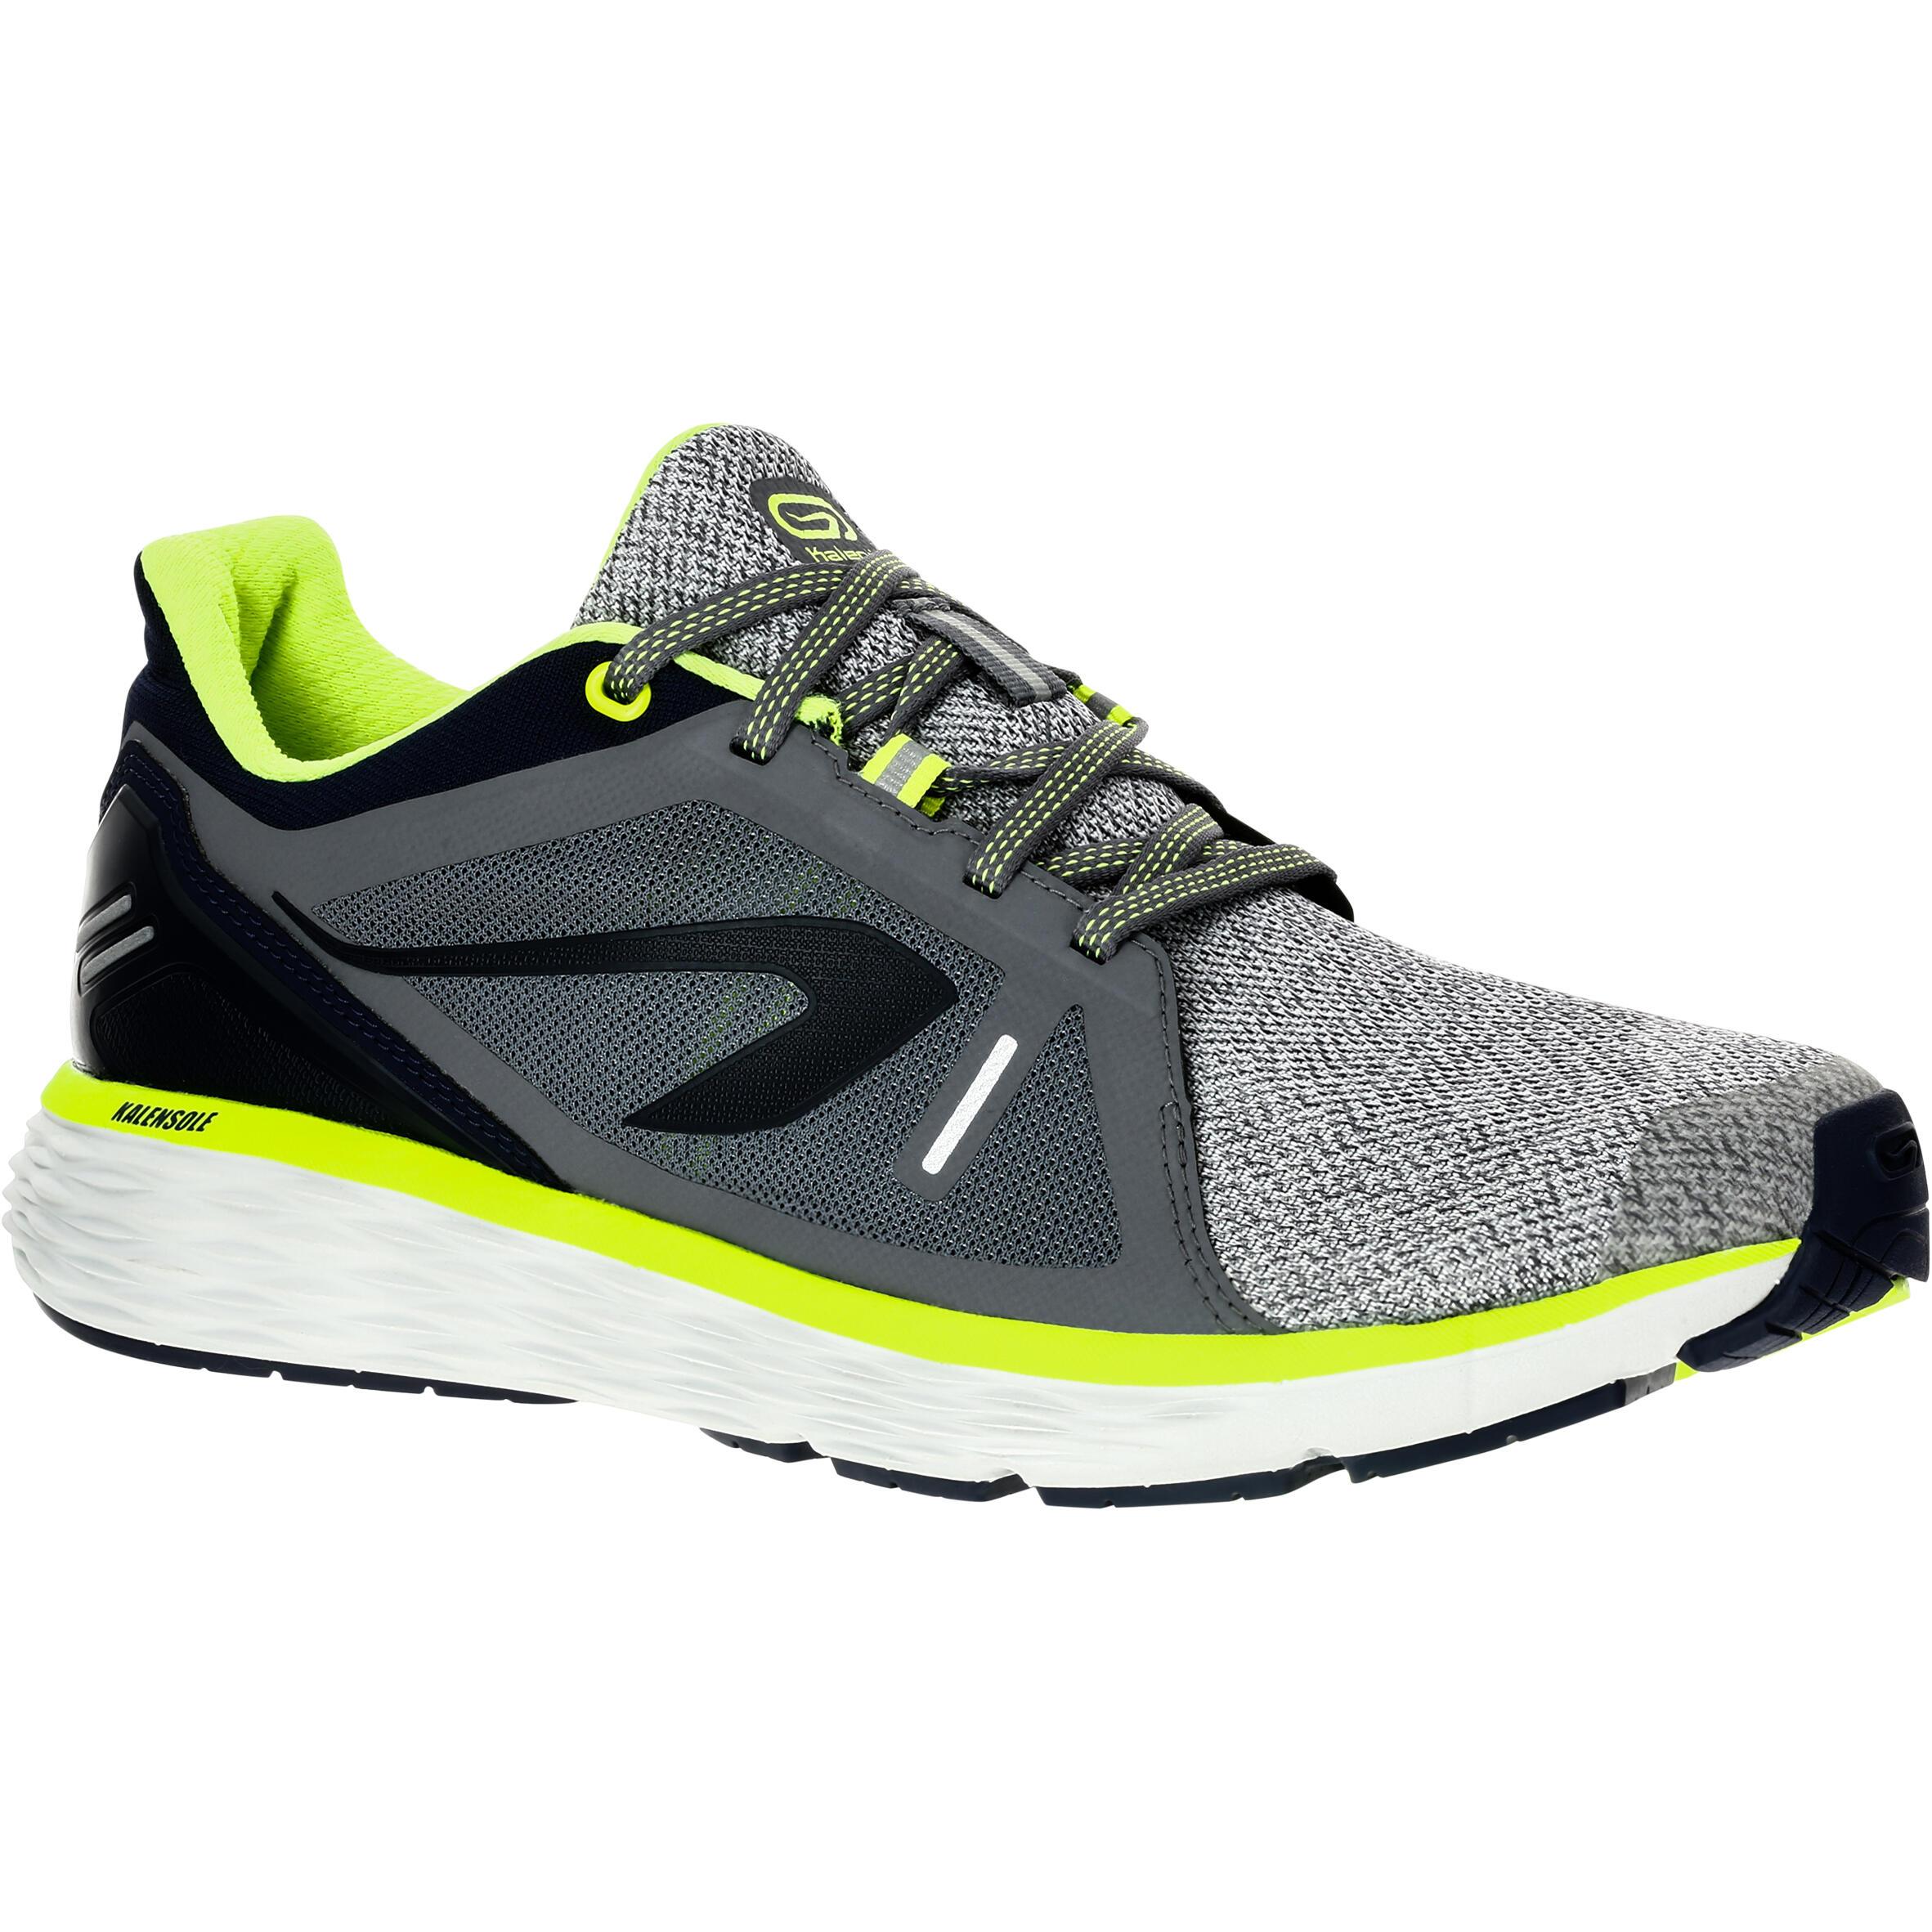 factory price f3a84 de39a RUN COMFORT MEN S RUNNING SHOES - GREY - PT Decathlon Sports Indonesia